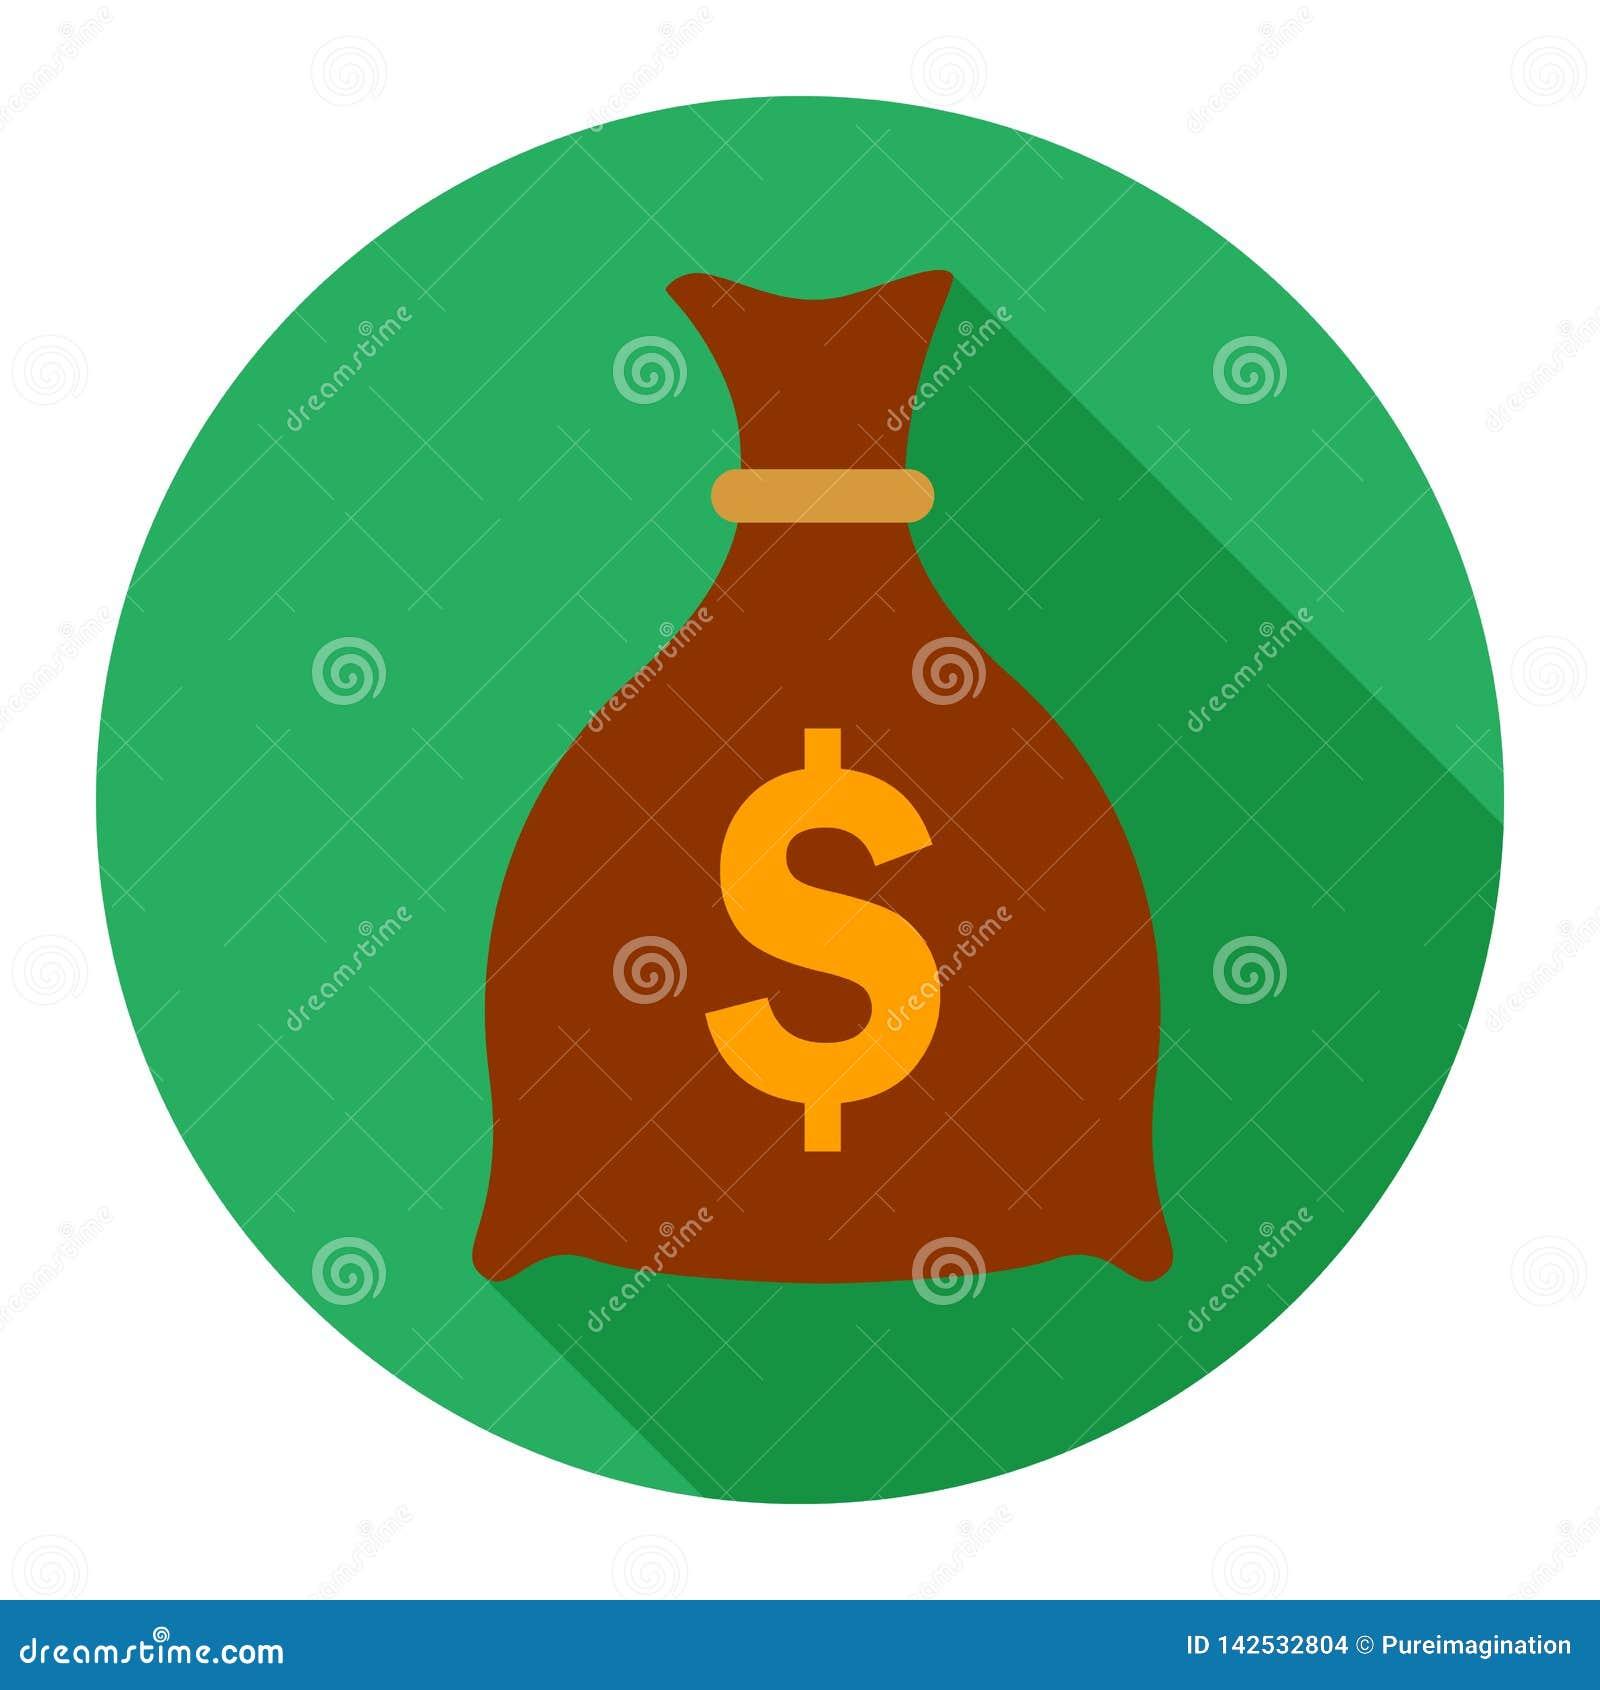 Money bag flat icon on green background